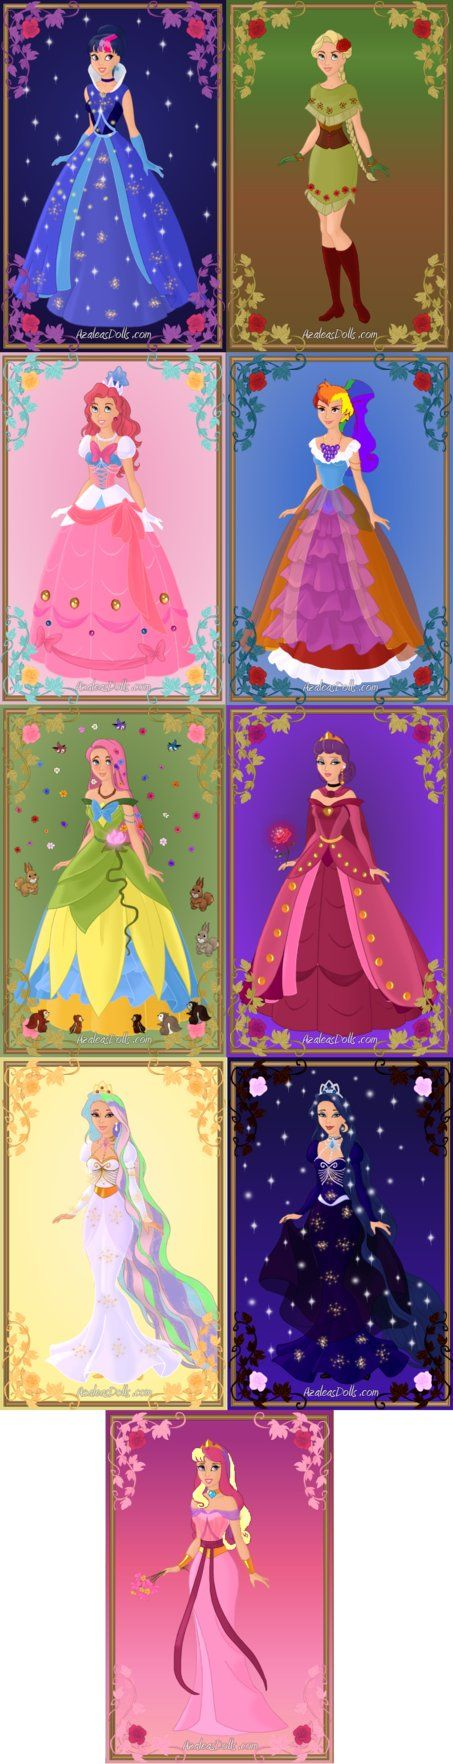 deviantART: variations Grand Galloping Gala Dresses.Cool right I really like it I'm Rainbow Dash who r u?